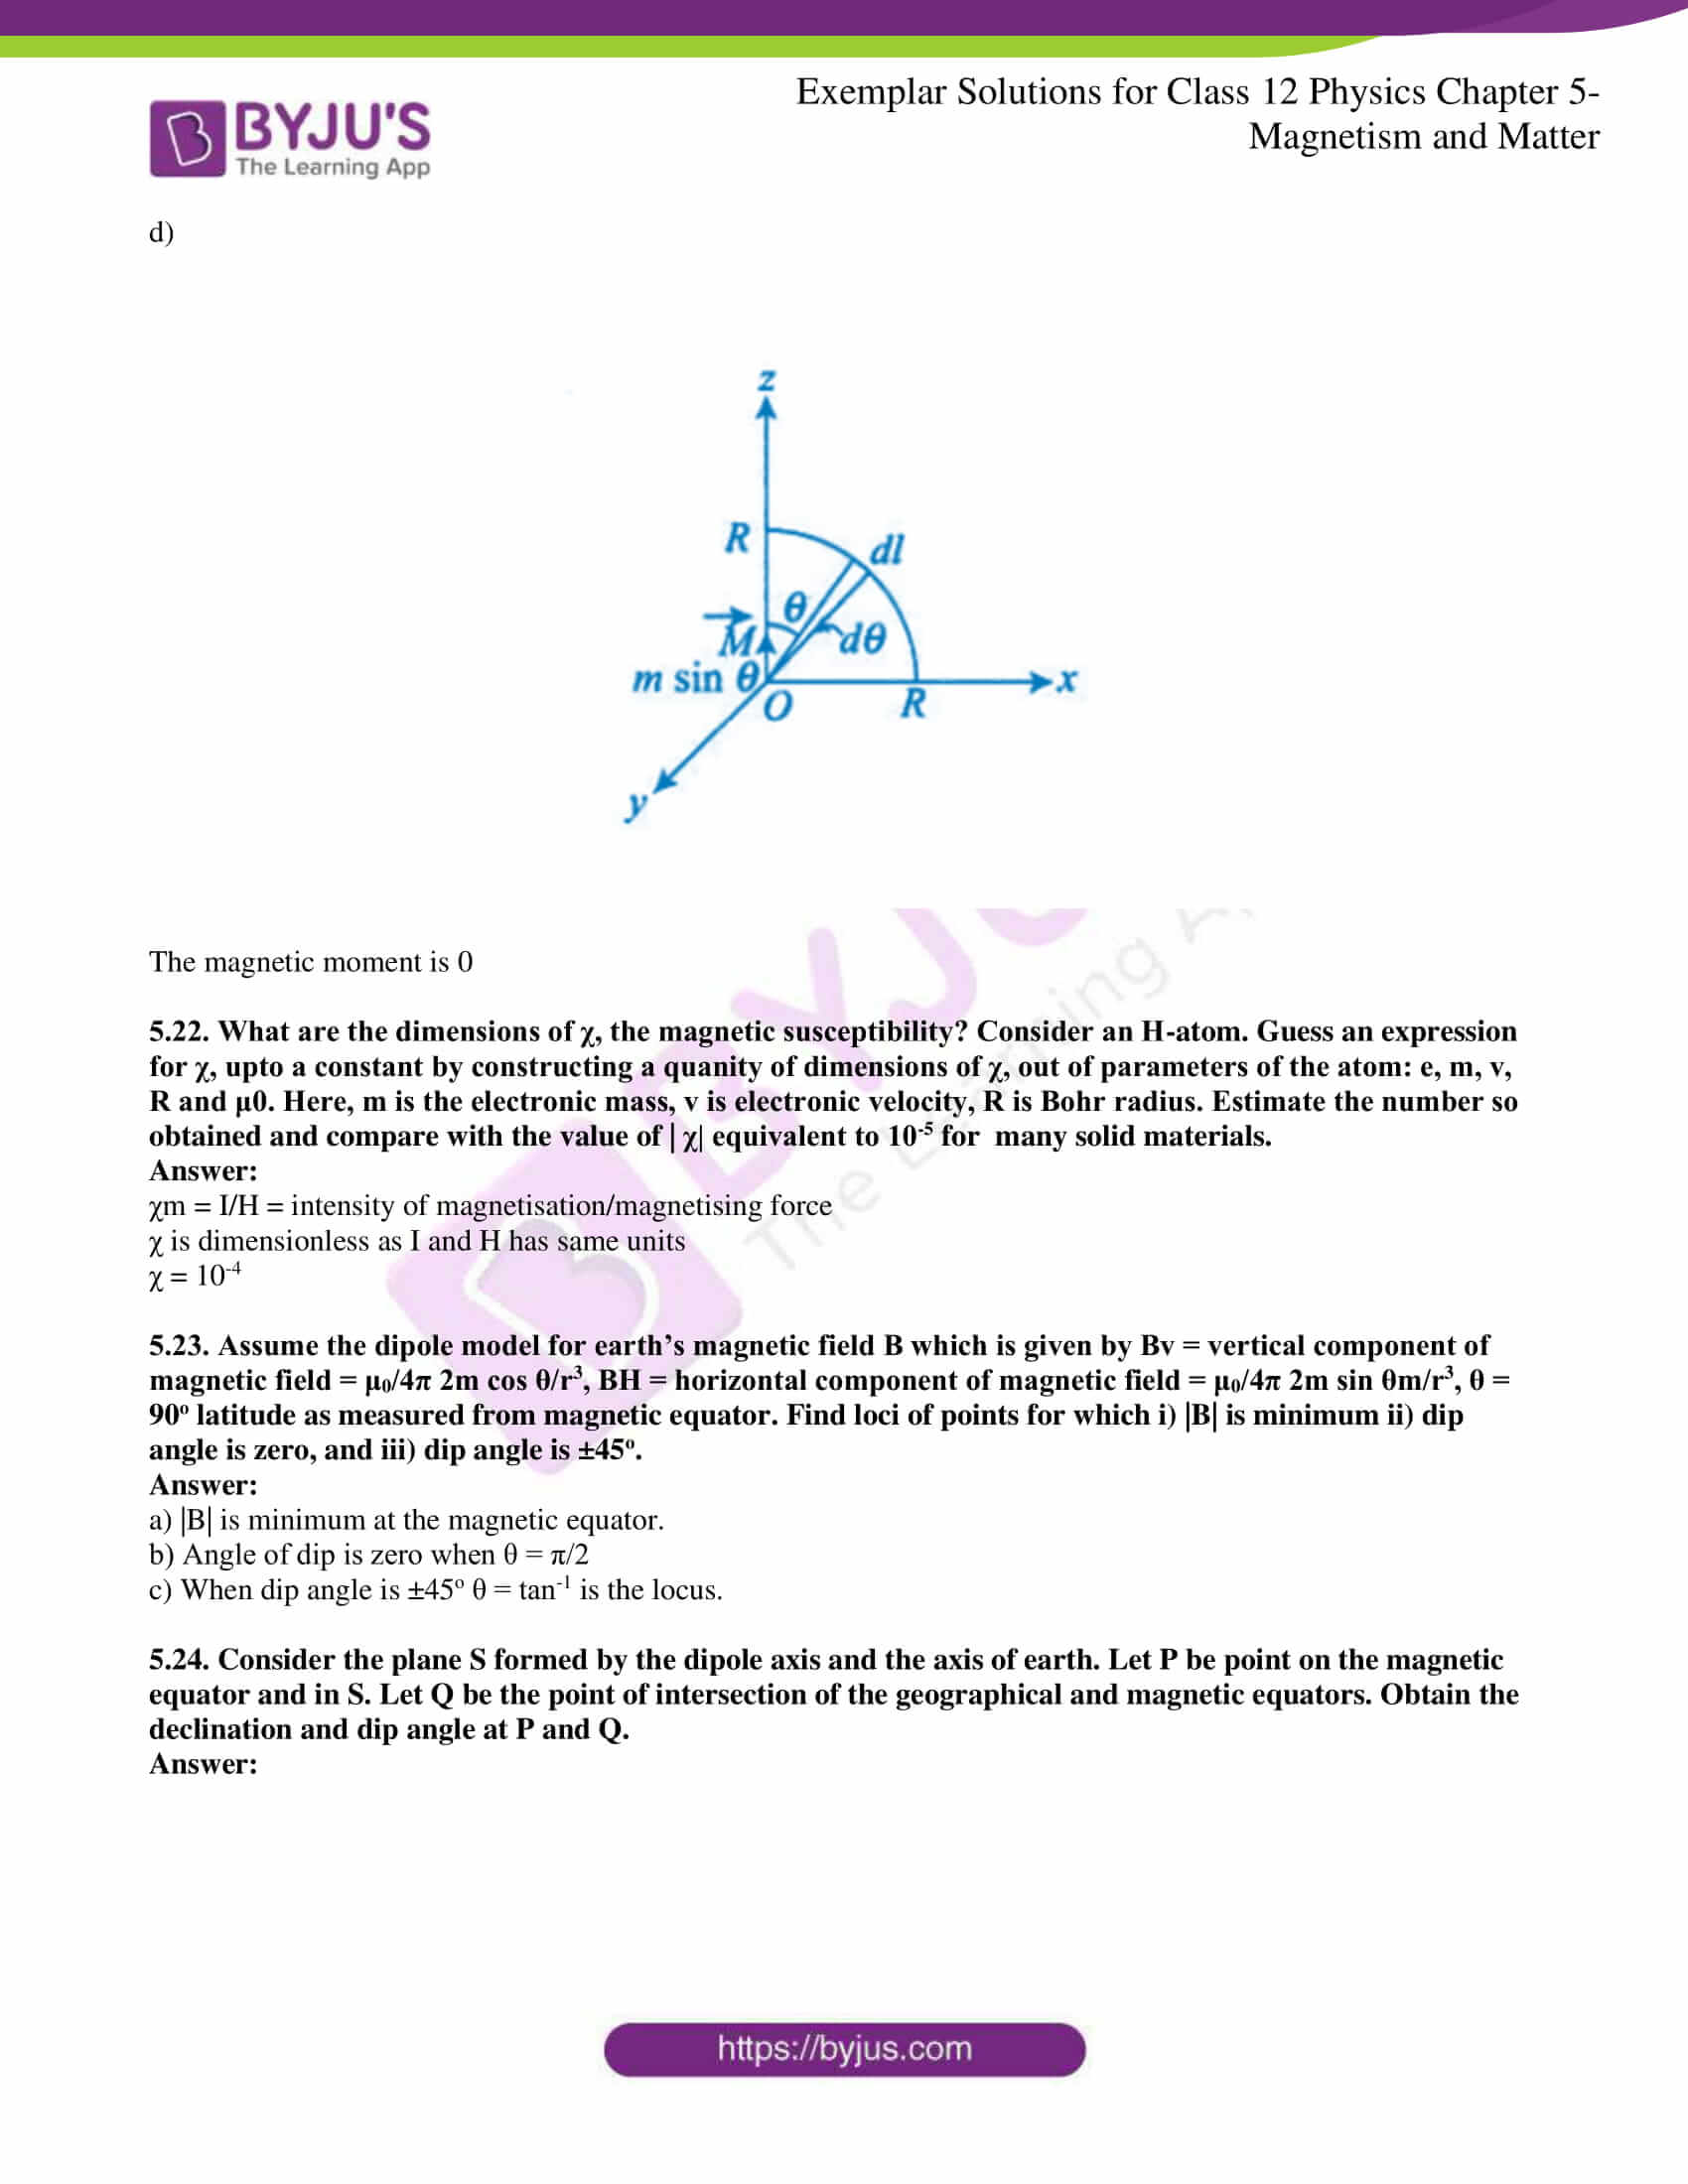 ncert exemplar solutions for class 12 physics chapter 5 09